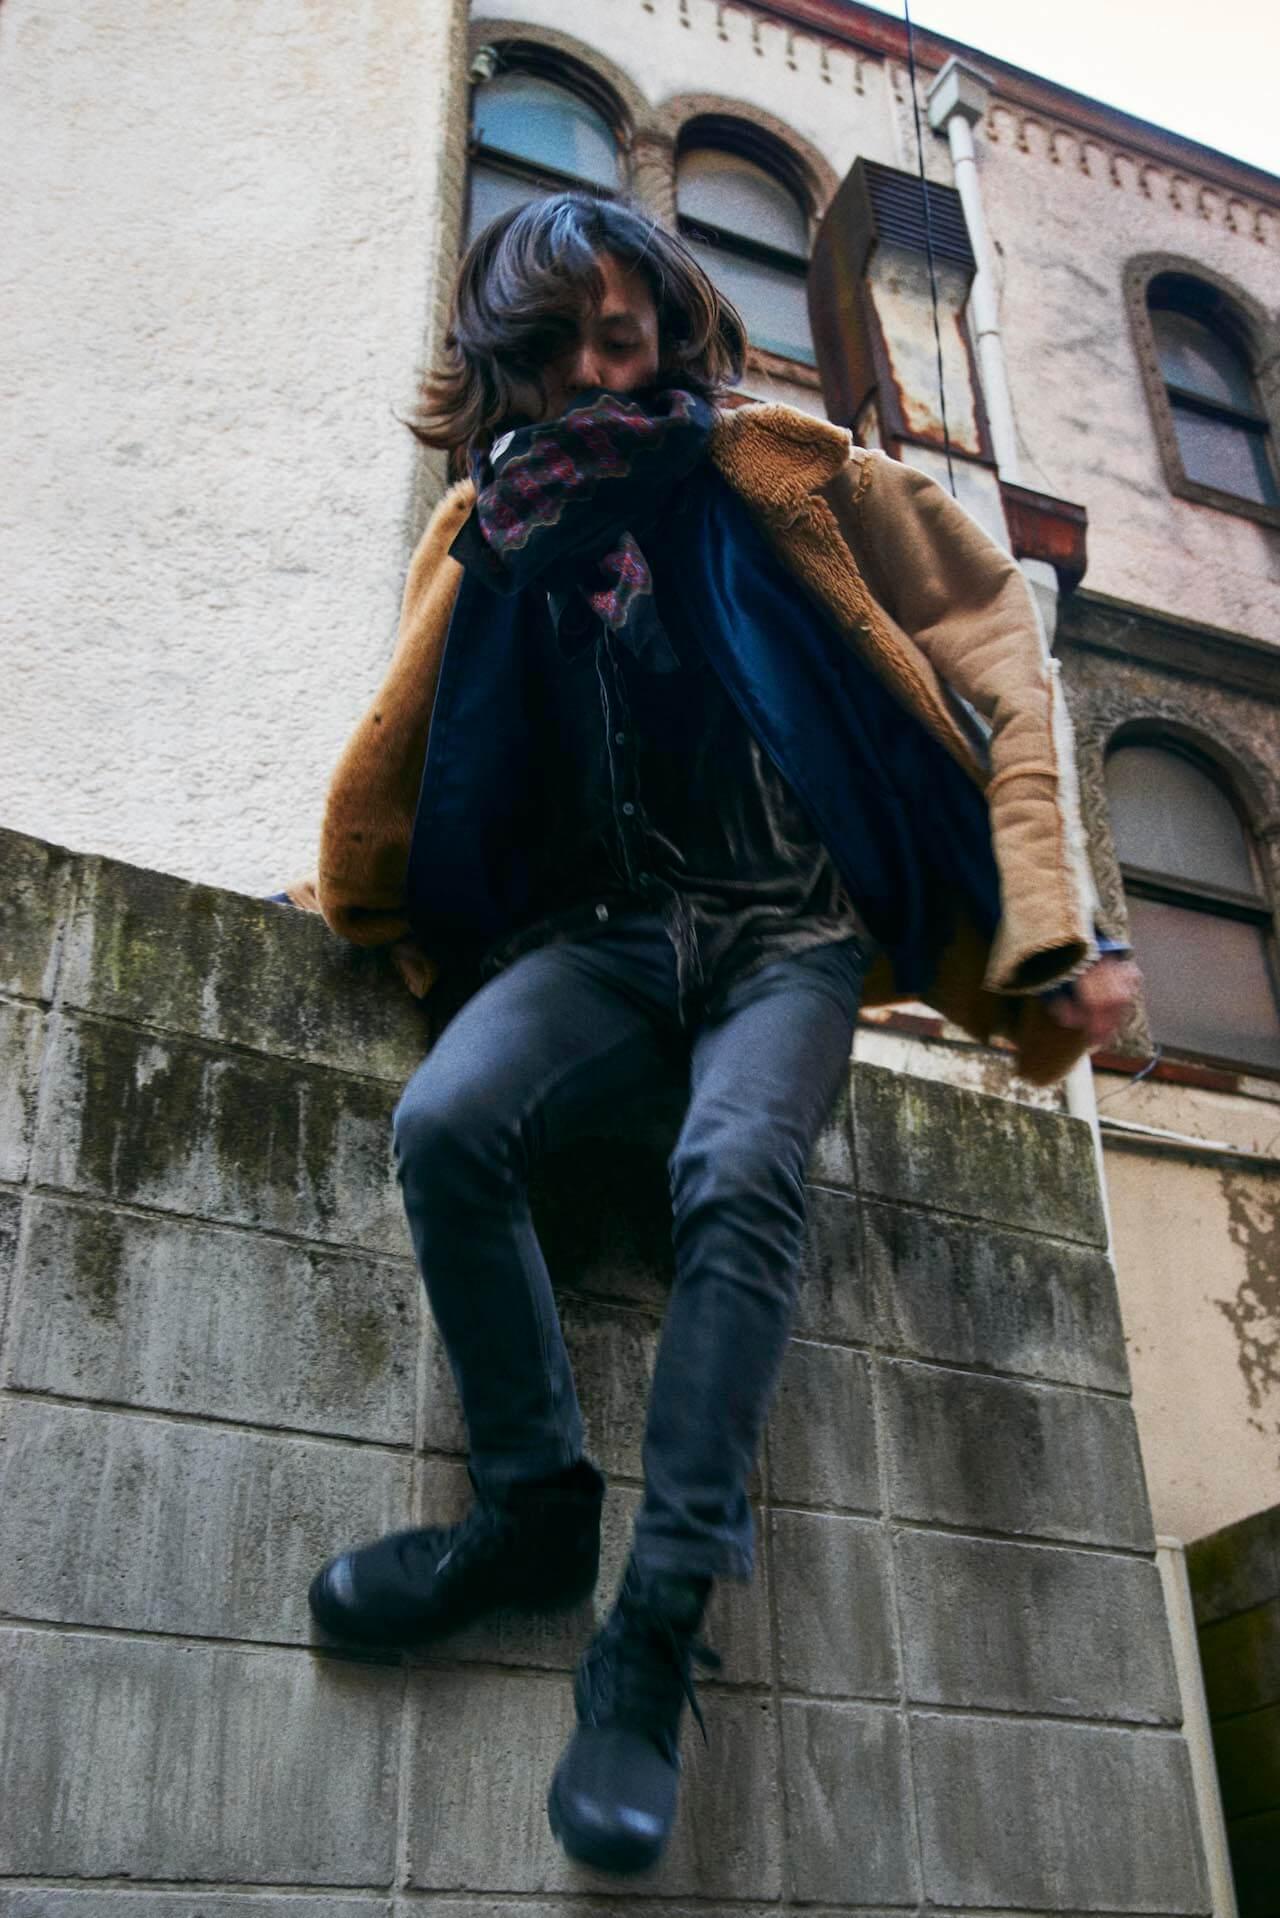 PALLADIUM徹底解剖|雨の日やアウトドア/フェスで大活躍するおしゃれな防水靴の秘密 life-fashion190704-palladium-